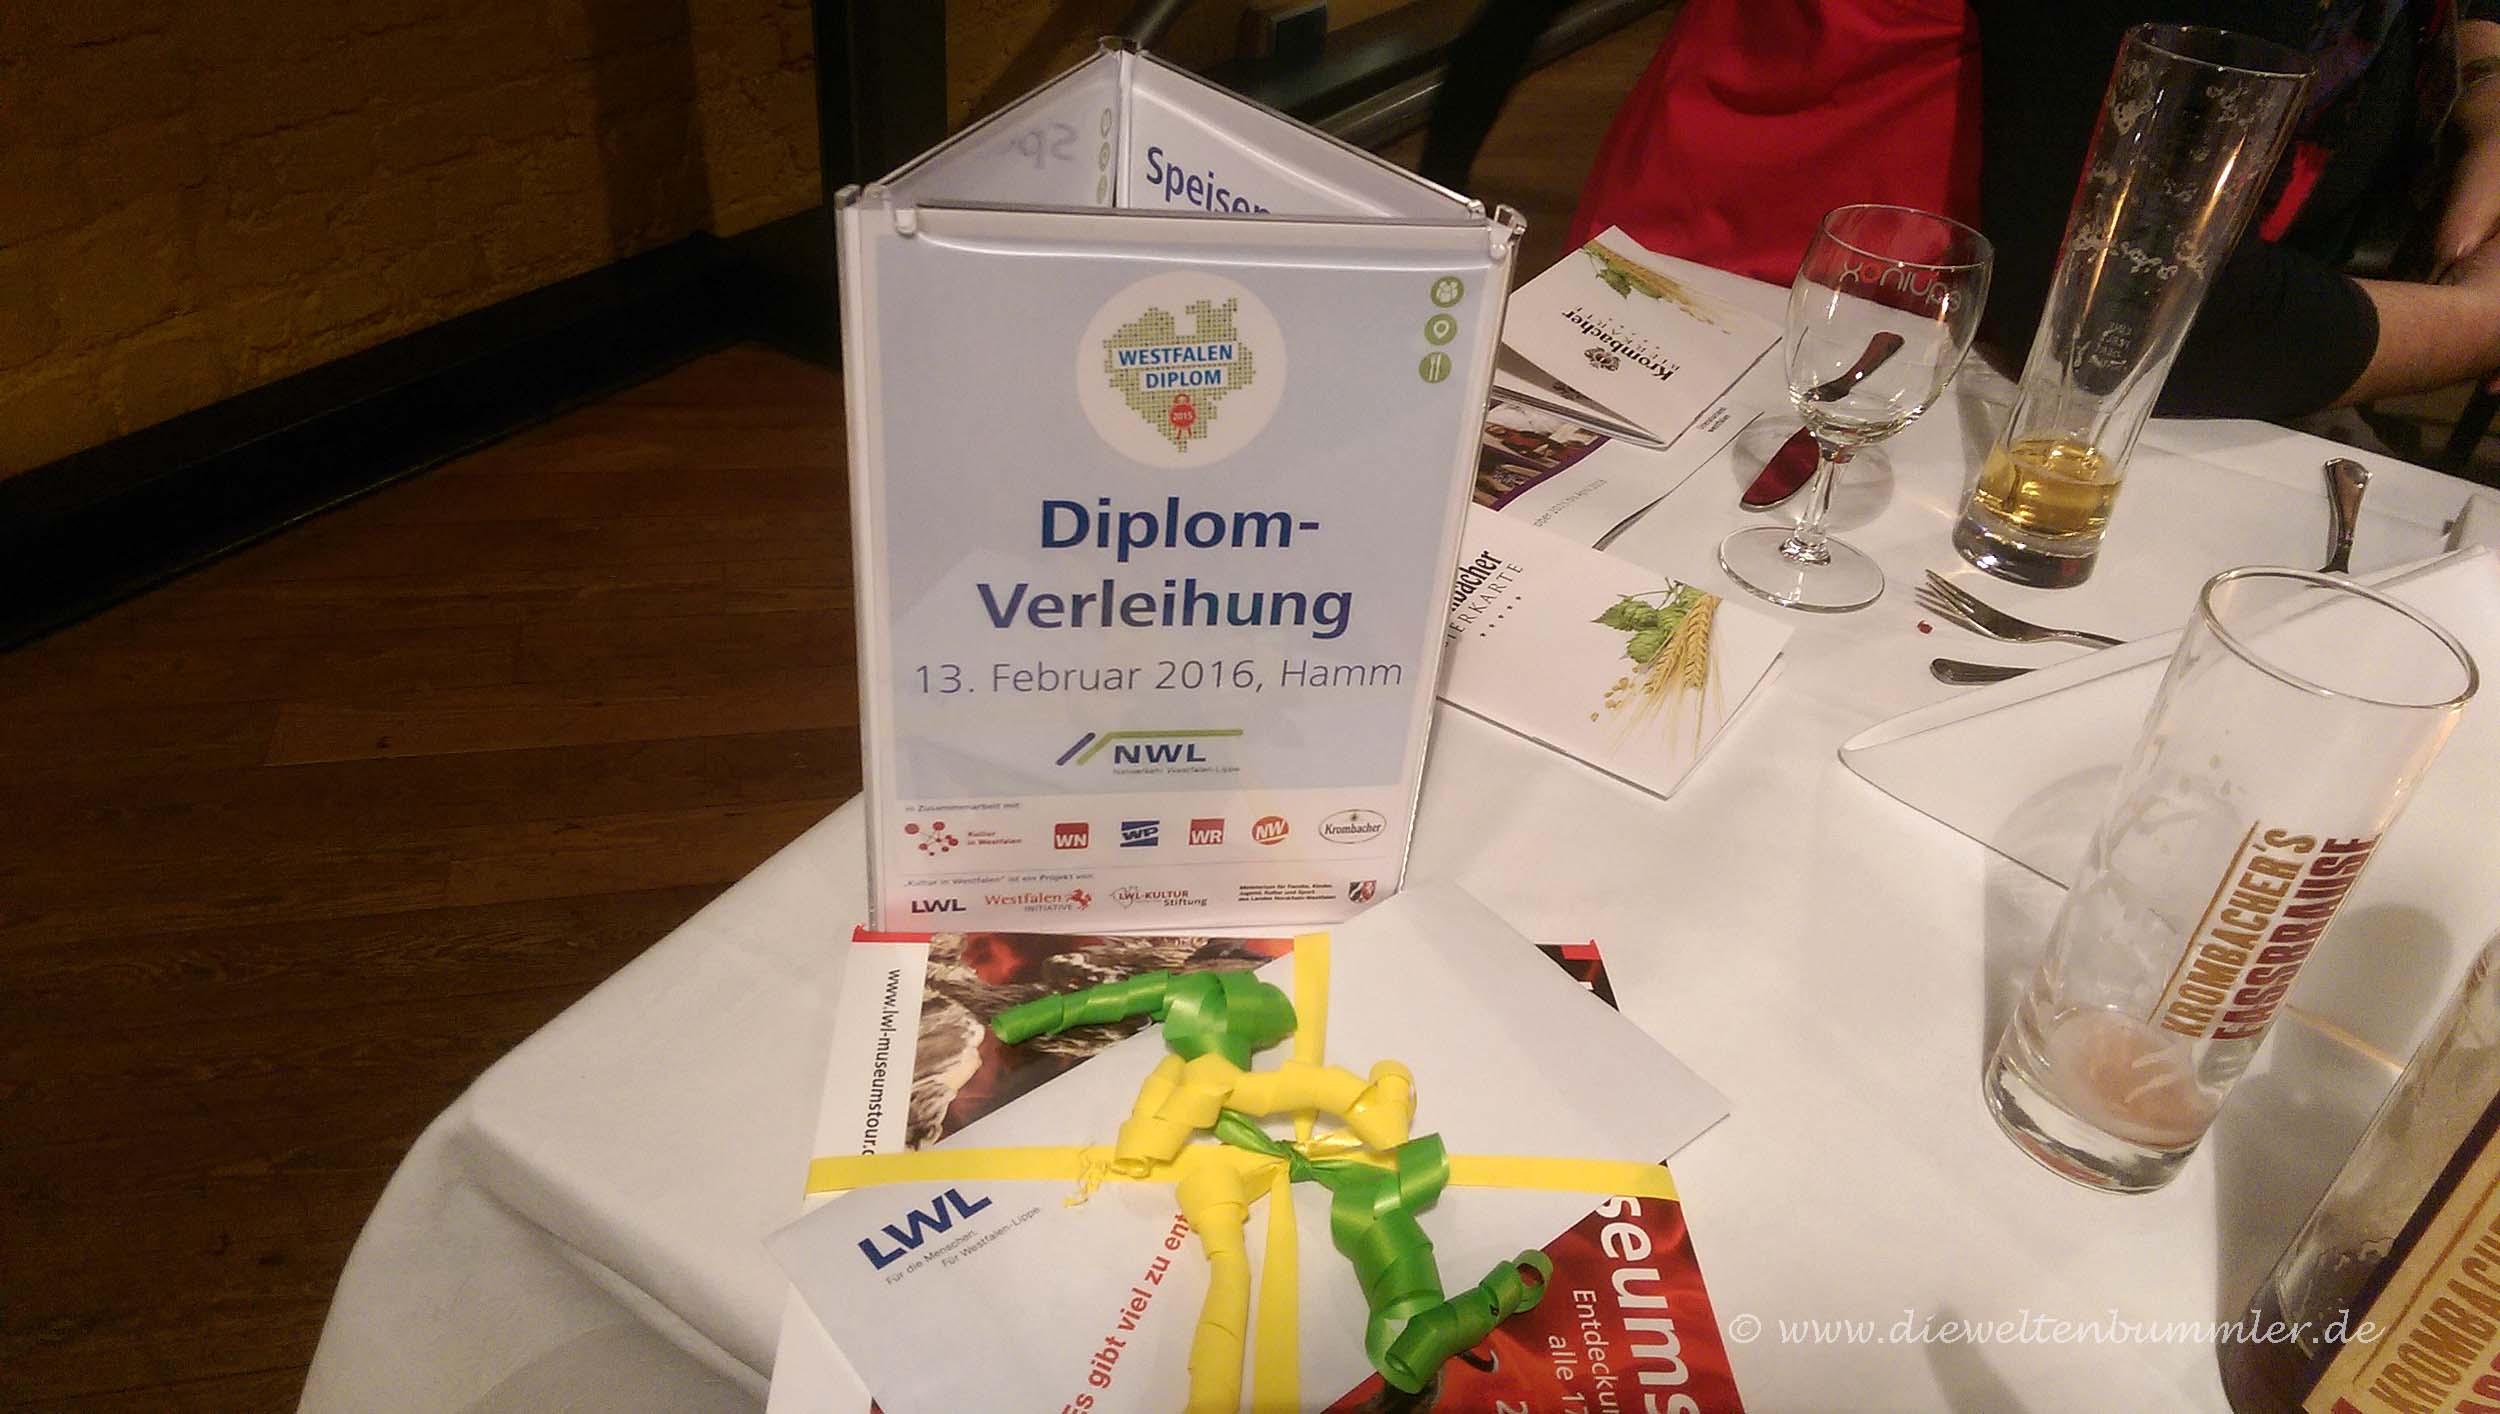 Diplom-Verleihung